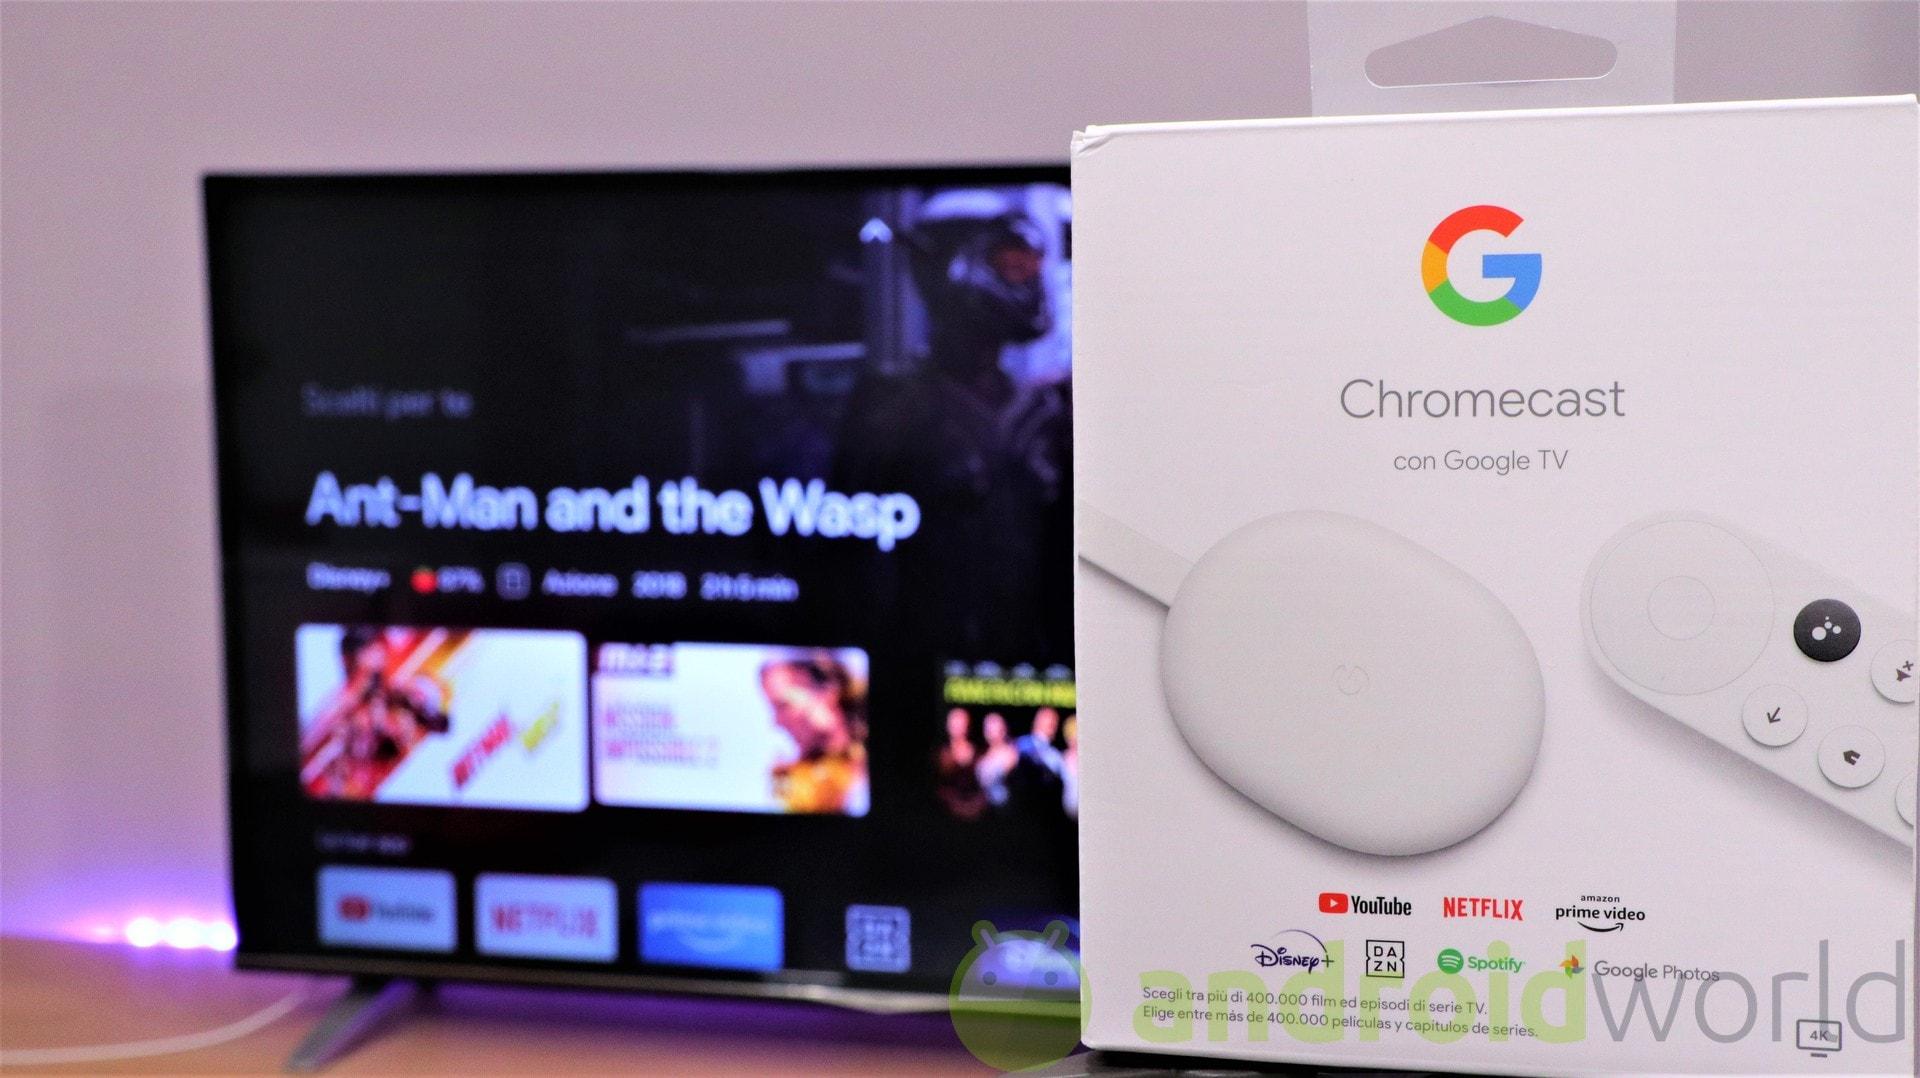 chromecast con google tv foto (16)